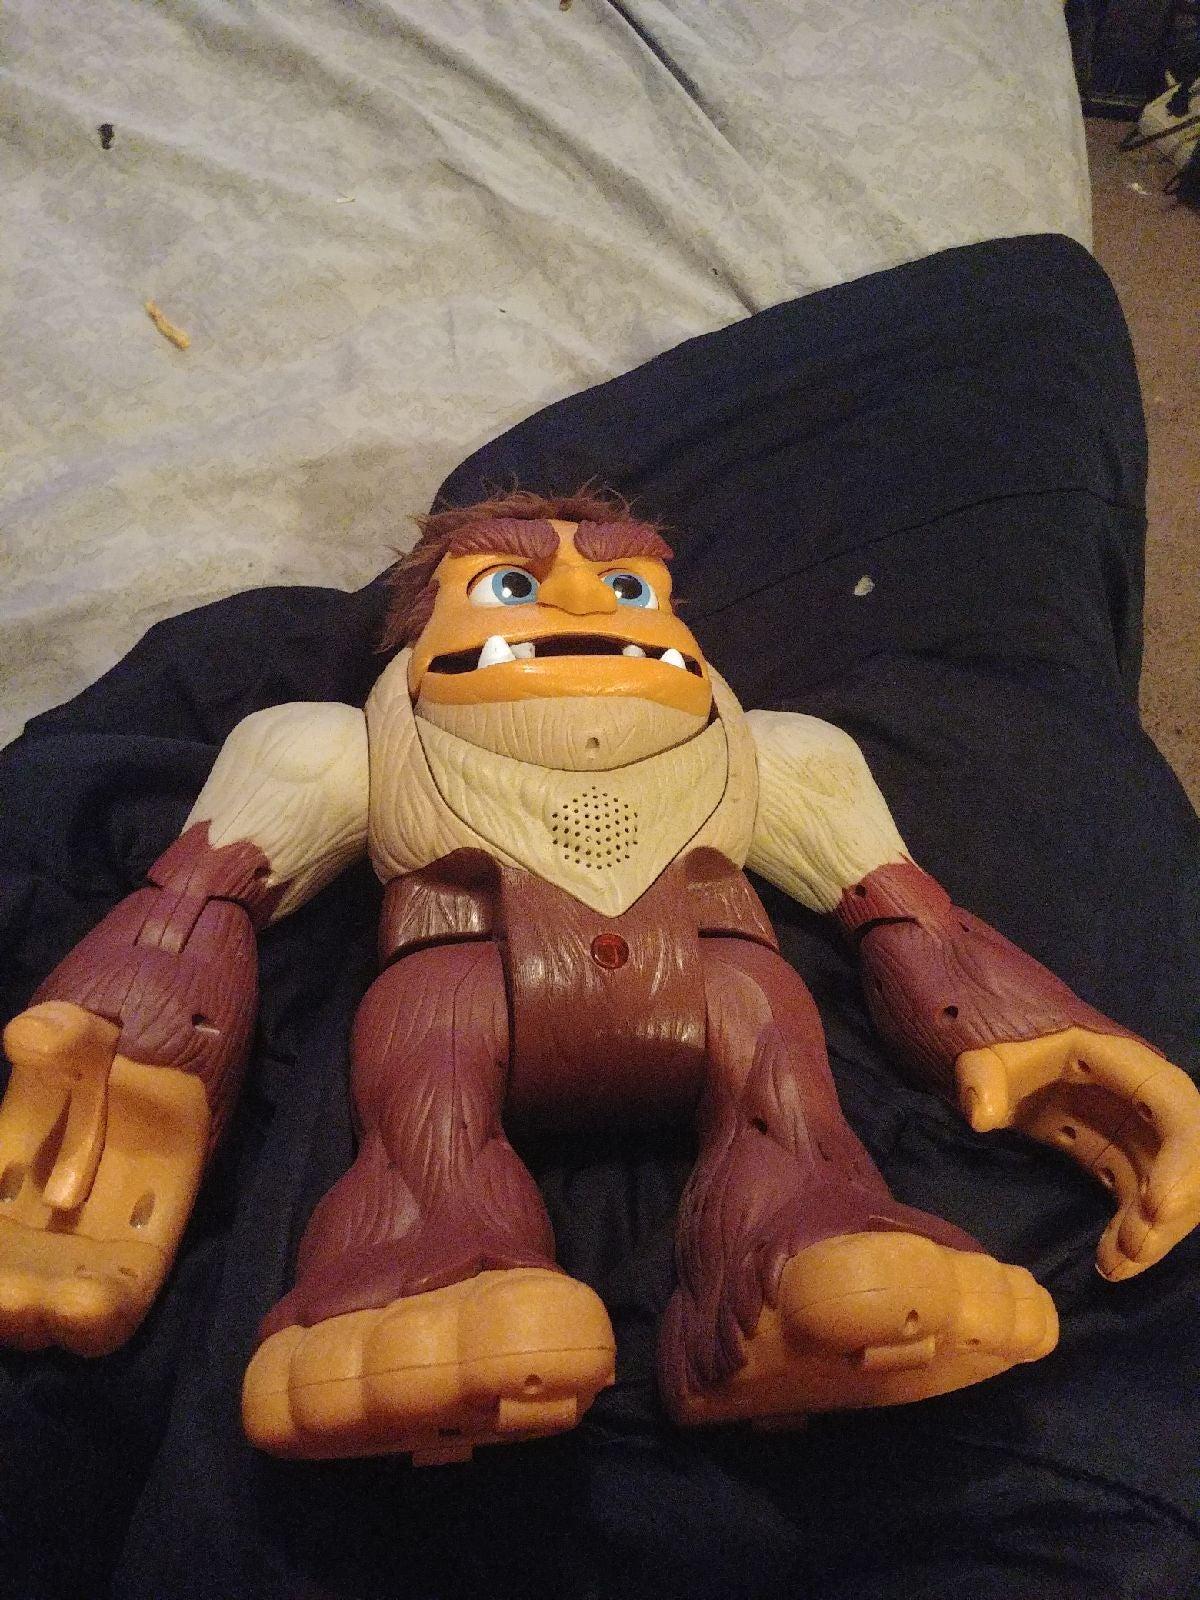 Fisher Price Bigfoot toy, no remote